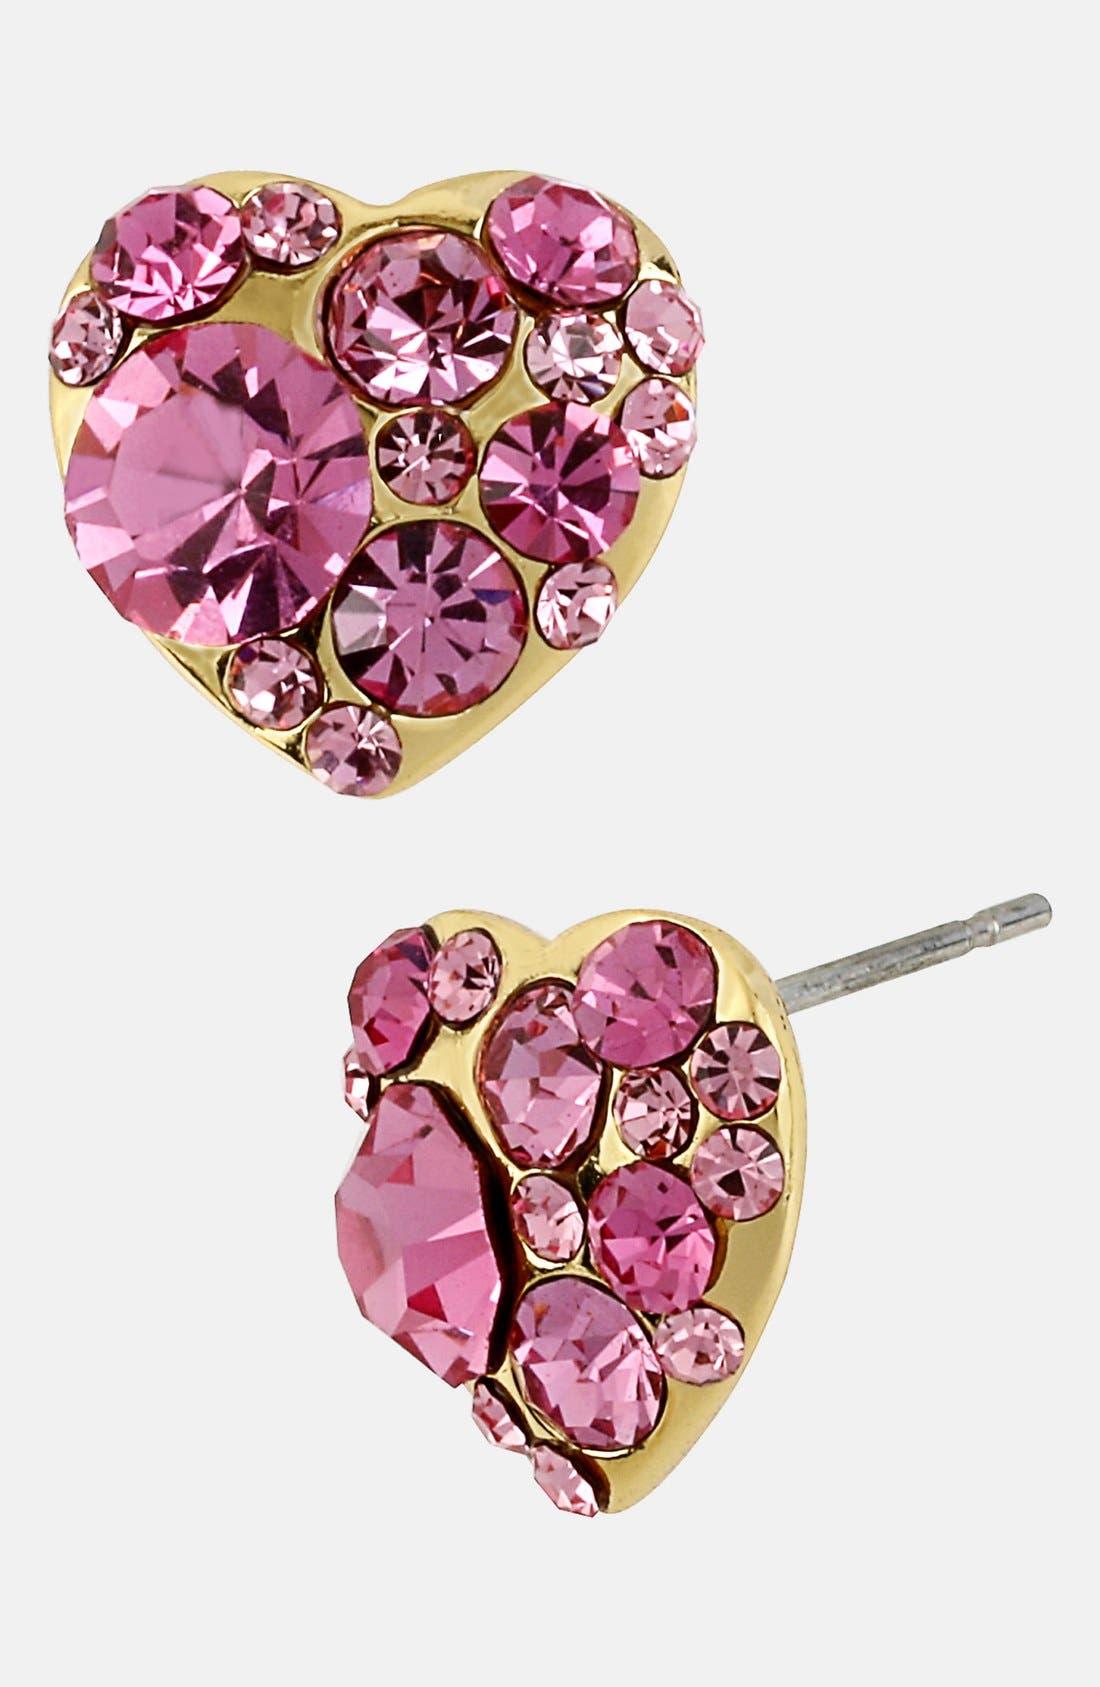 Alternate Image 1 Selected - Betsey Johnson 'Iconic Pinkalicious' Heart Stud Earrings